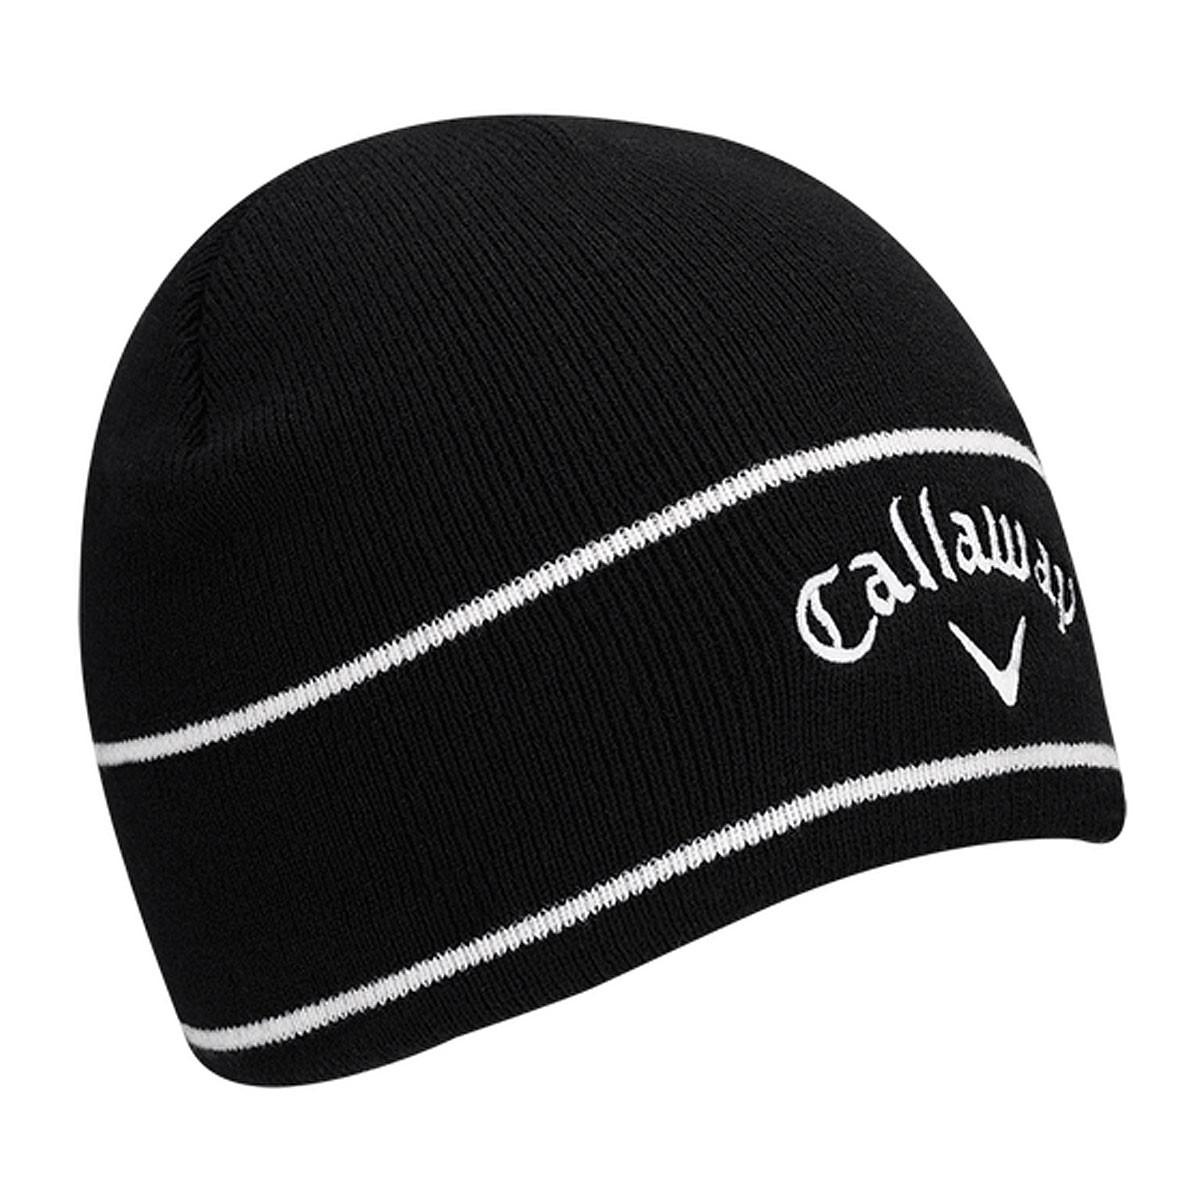 Callaway Golf Mens 2019 TA Beanie Hat - Golf Headwear - Men - Golf 742b1703238